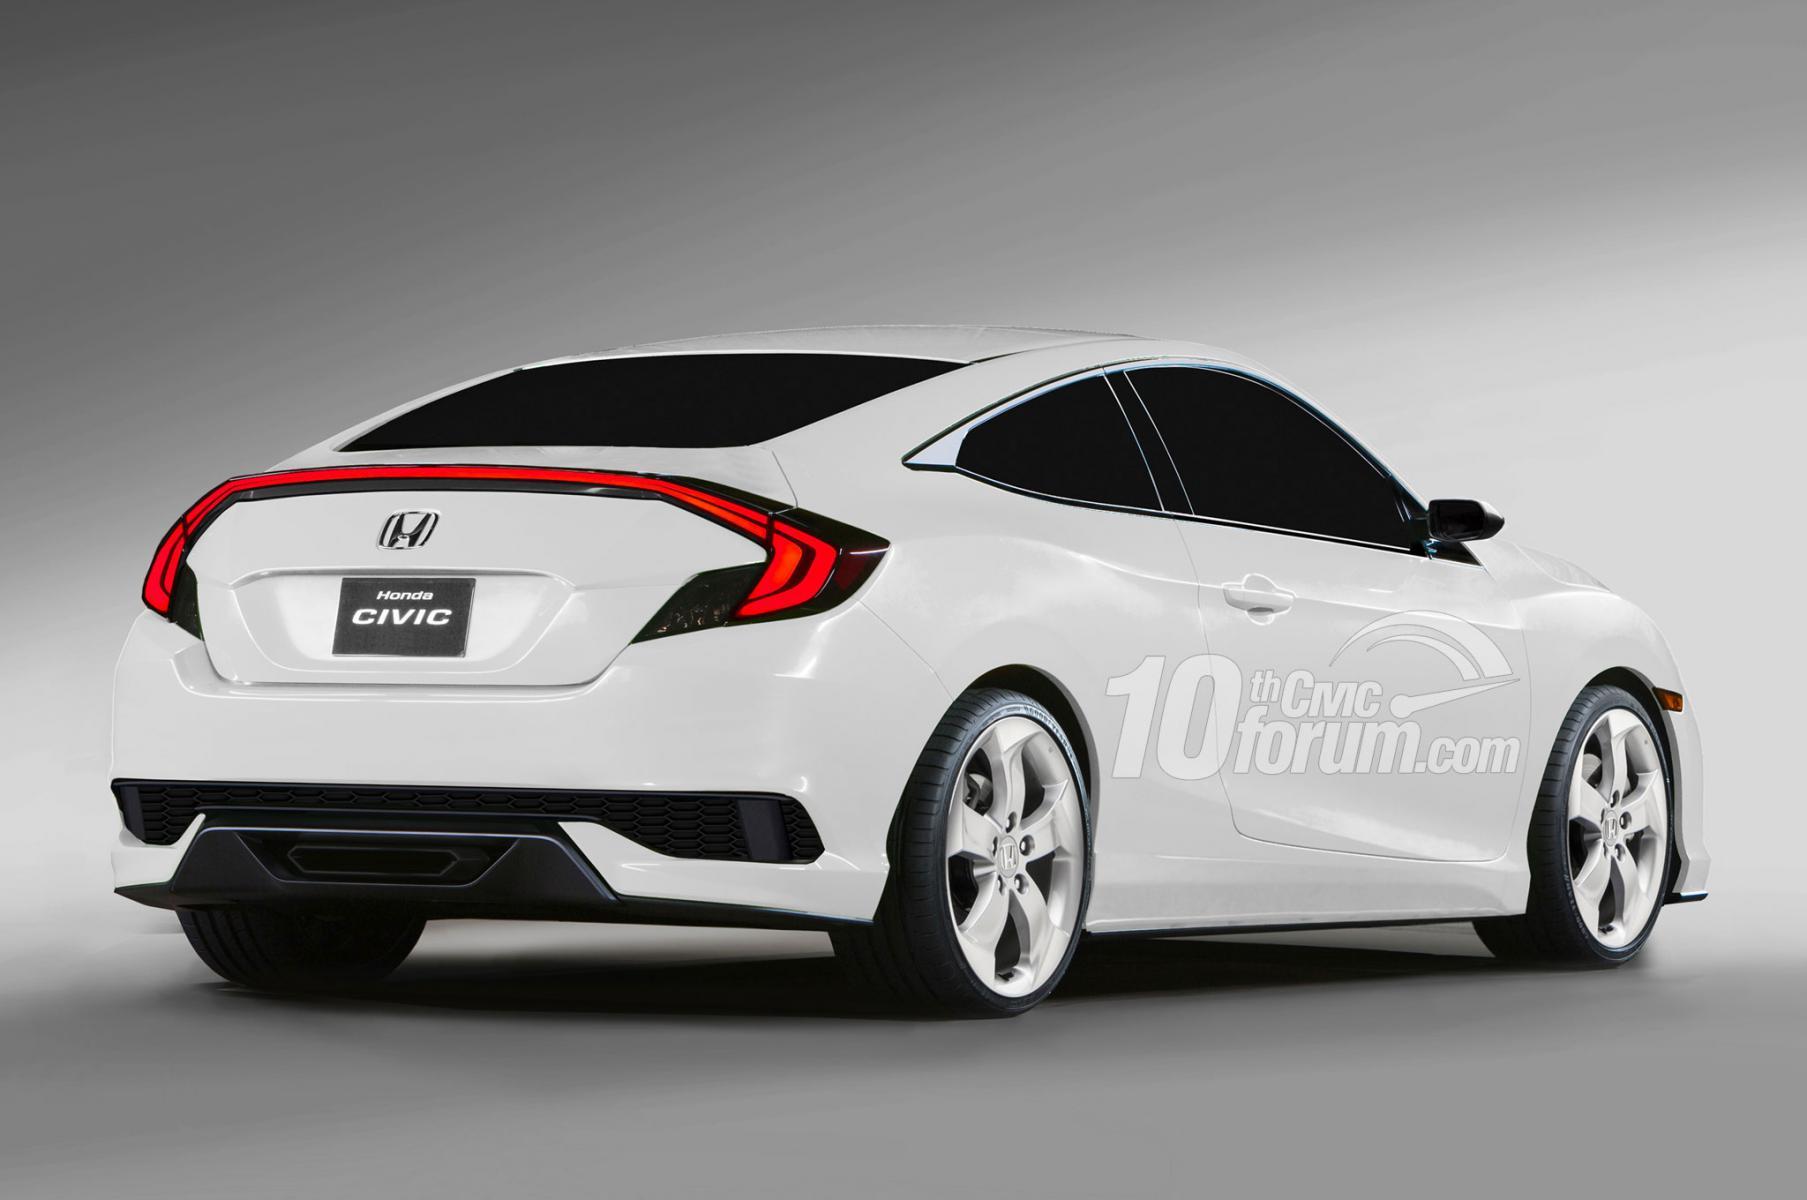 2016 Nissan Juke >> 2016 Honda Civic Will Come In Four Body Styles - PakWheels Blog